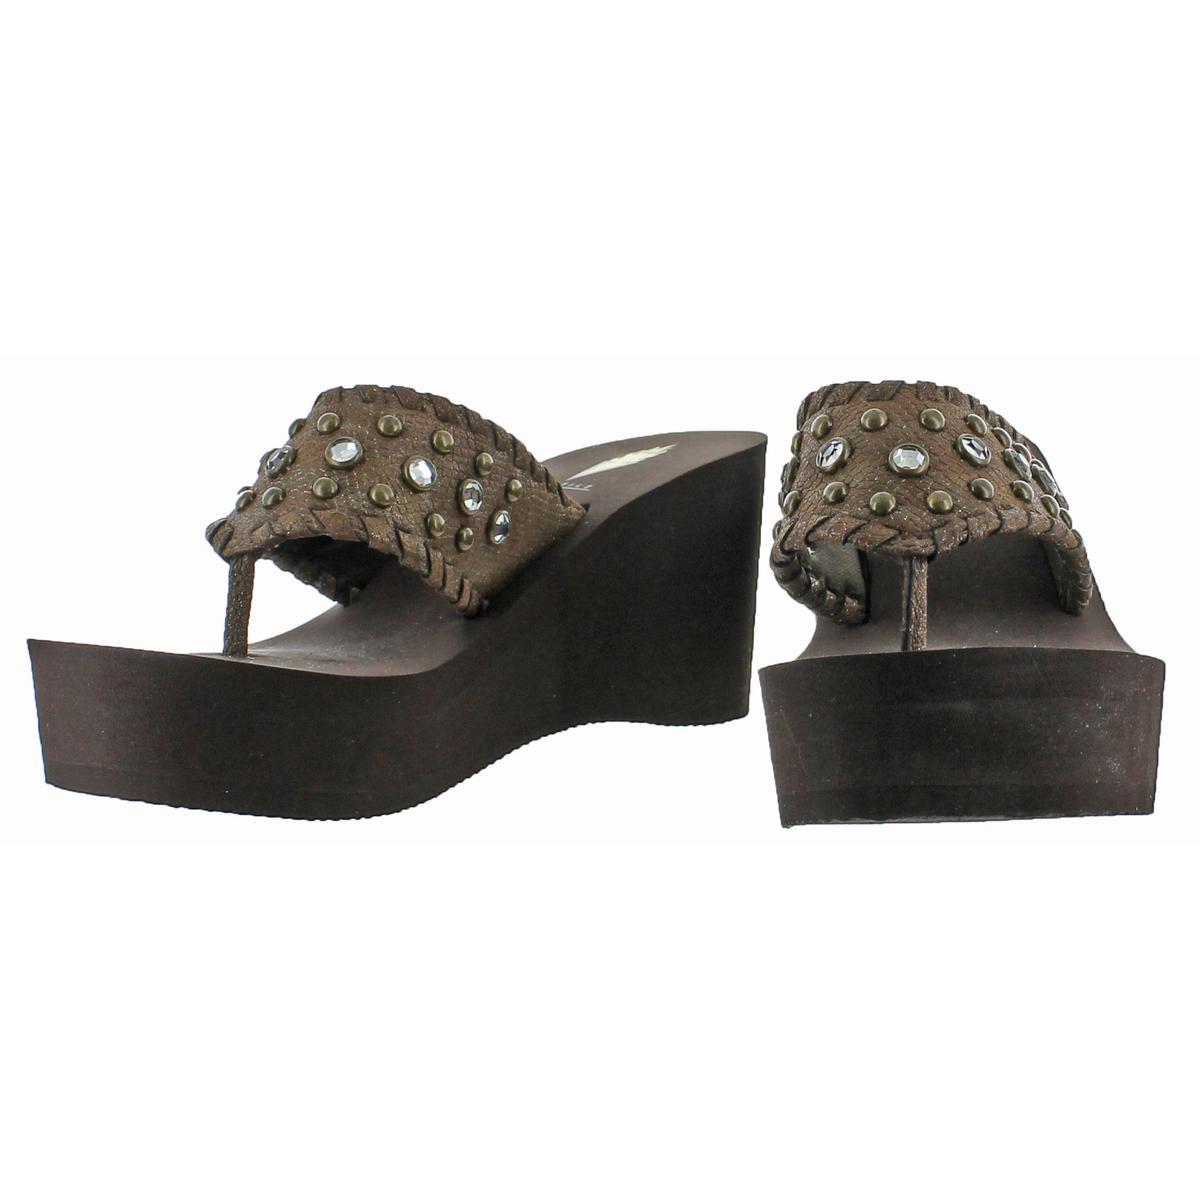 Volatile-Billyray-Women-039-s-Studded-Metallic-Slip-On-Platform-Wedge-Sandals-Shoes thumbnail 4